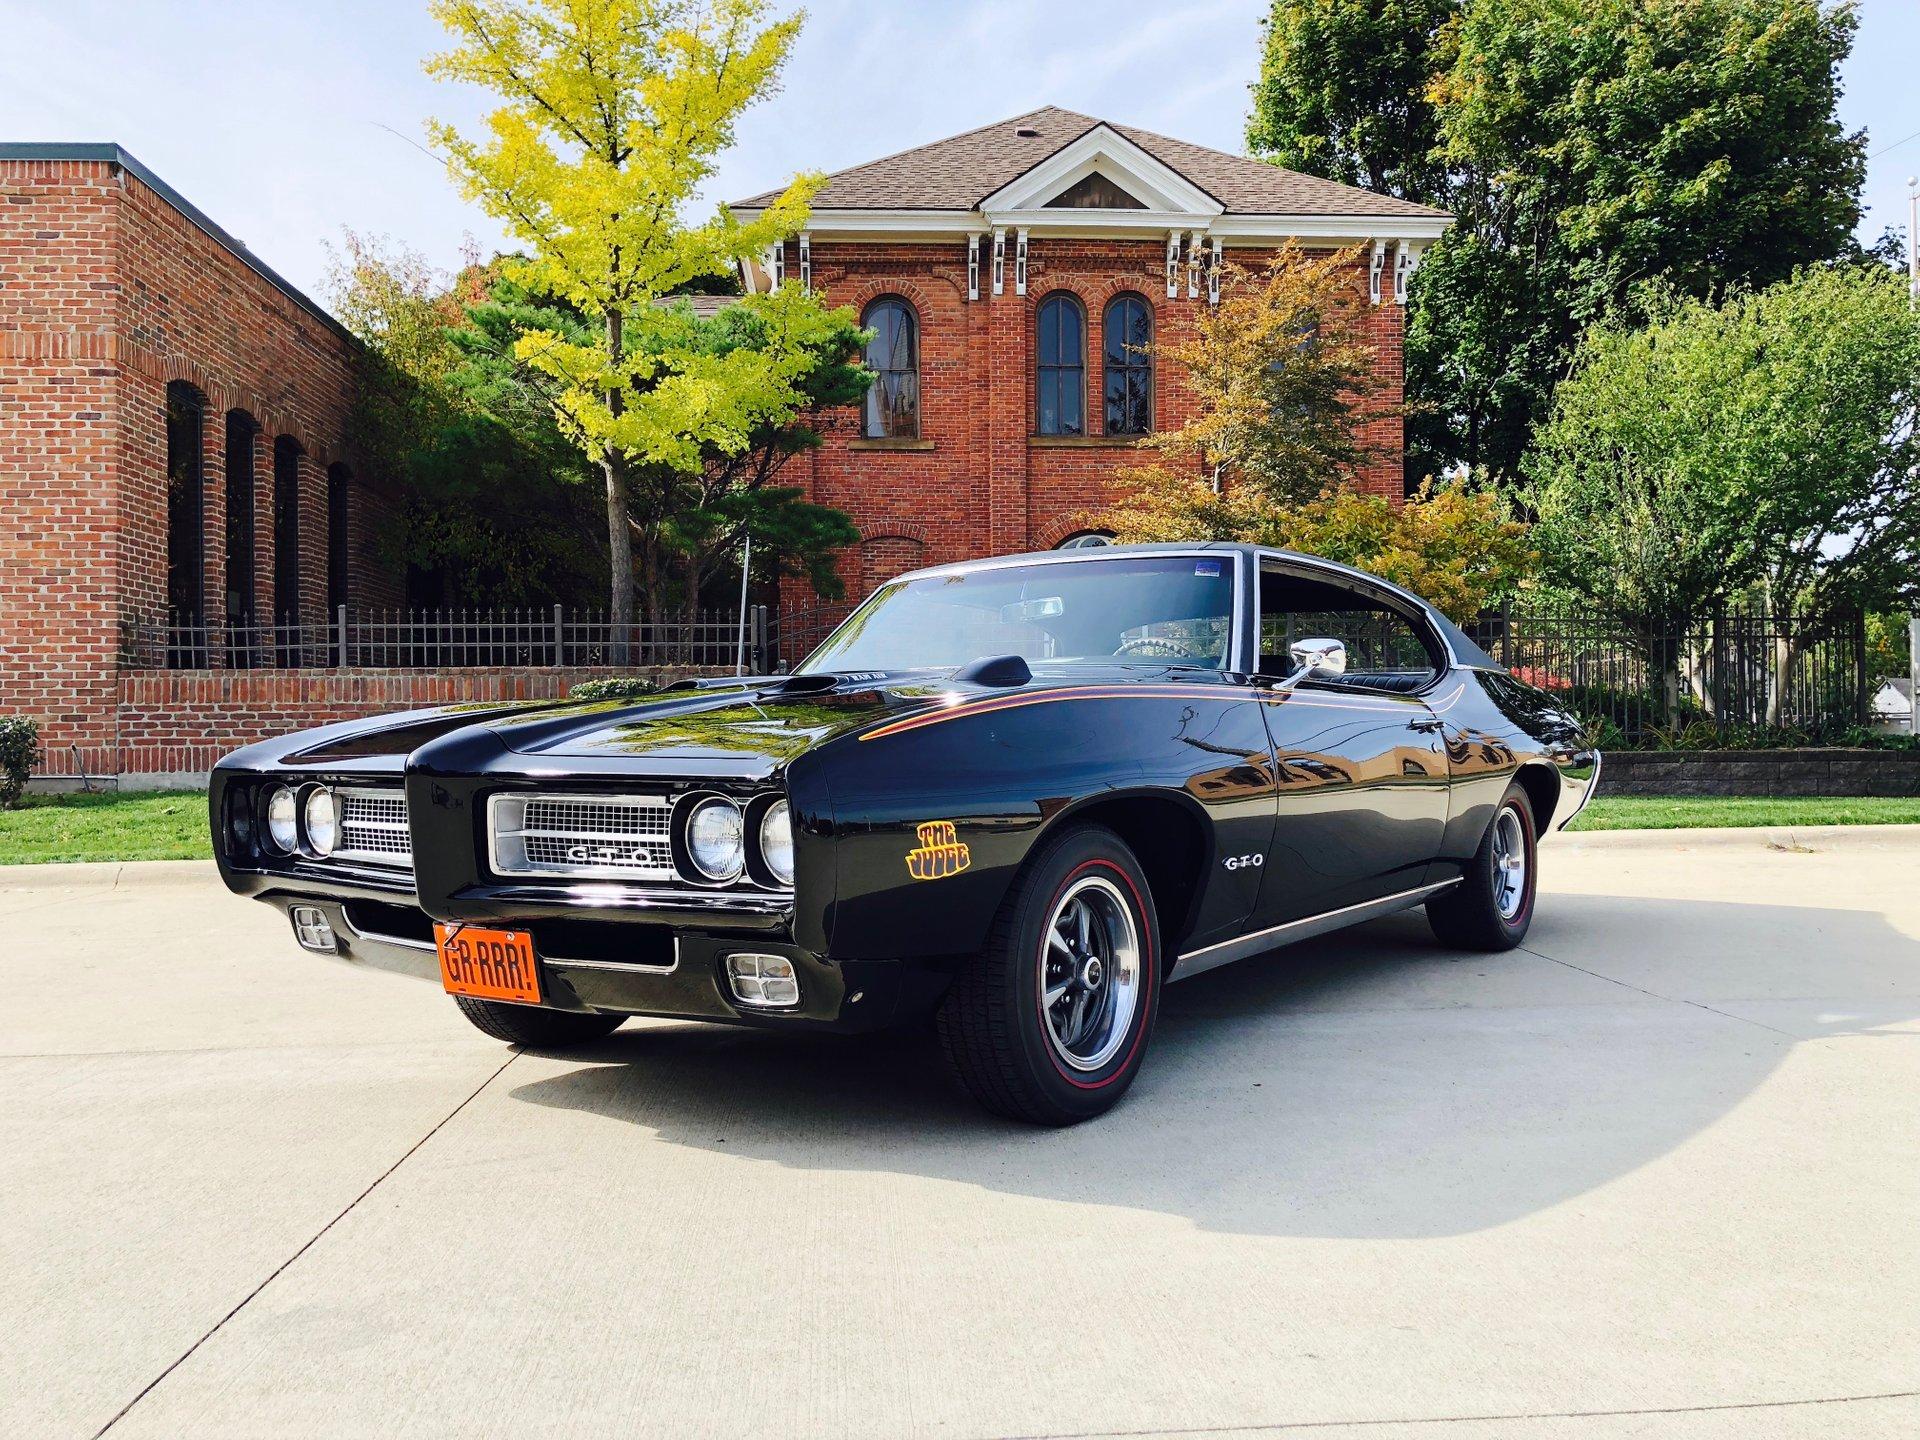 1969 Pontiac GTO | Showdown Auto Sales - Drive Your Dream